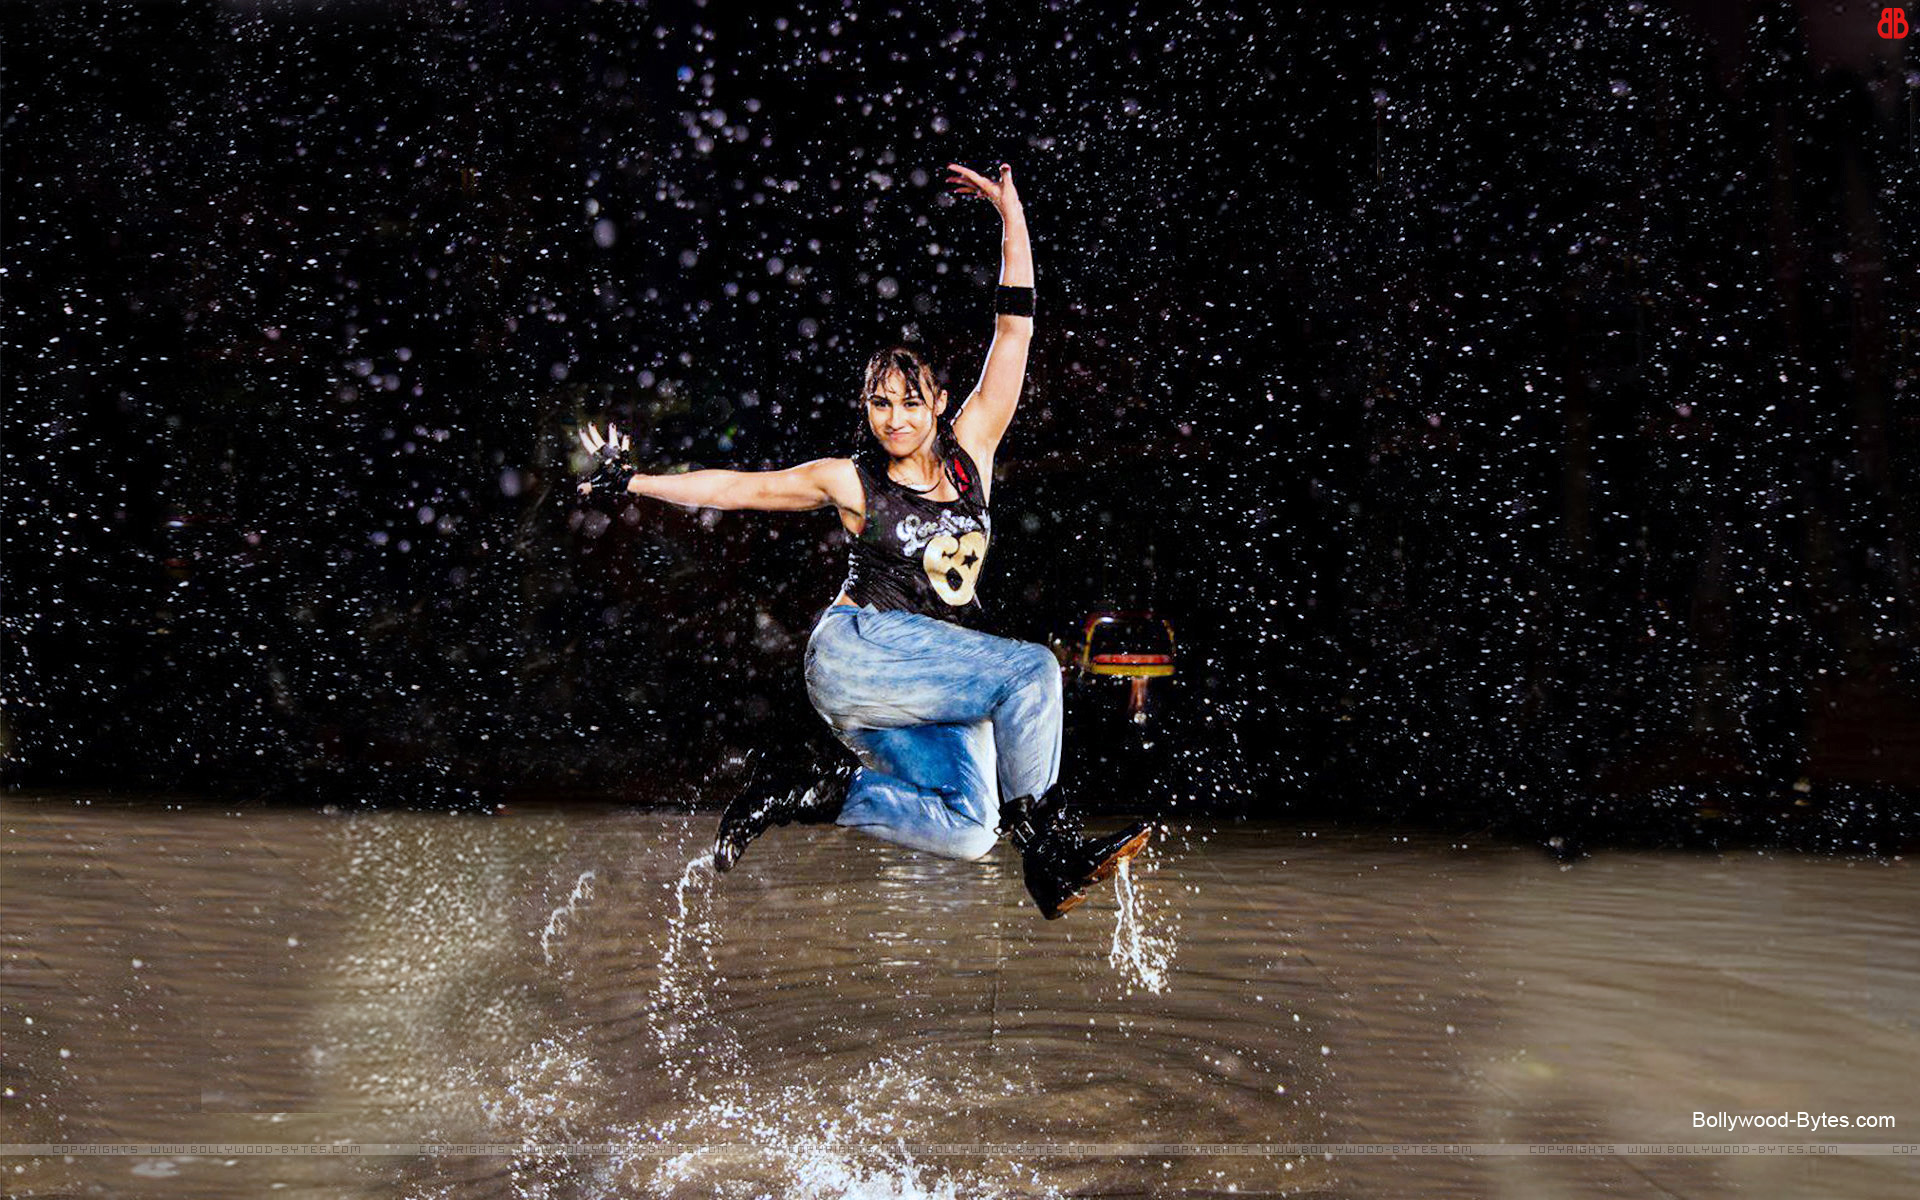 https://1.bp.blogspot.com/-5-p1CwH22gk/URdftjtMi5I/AAAAAAAAayA/AxC0X-QCZKY/s1920/ABCD-Any-Body-Can-Dance-++Hot-Lauren-Gottlieb-HD-Wallpaper-13 .jpg